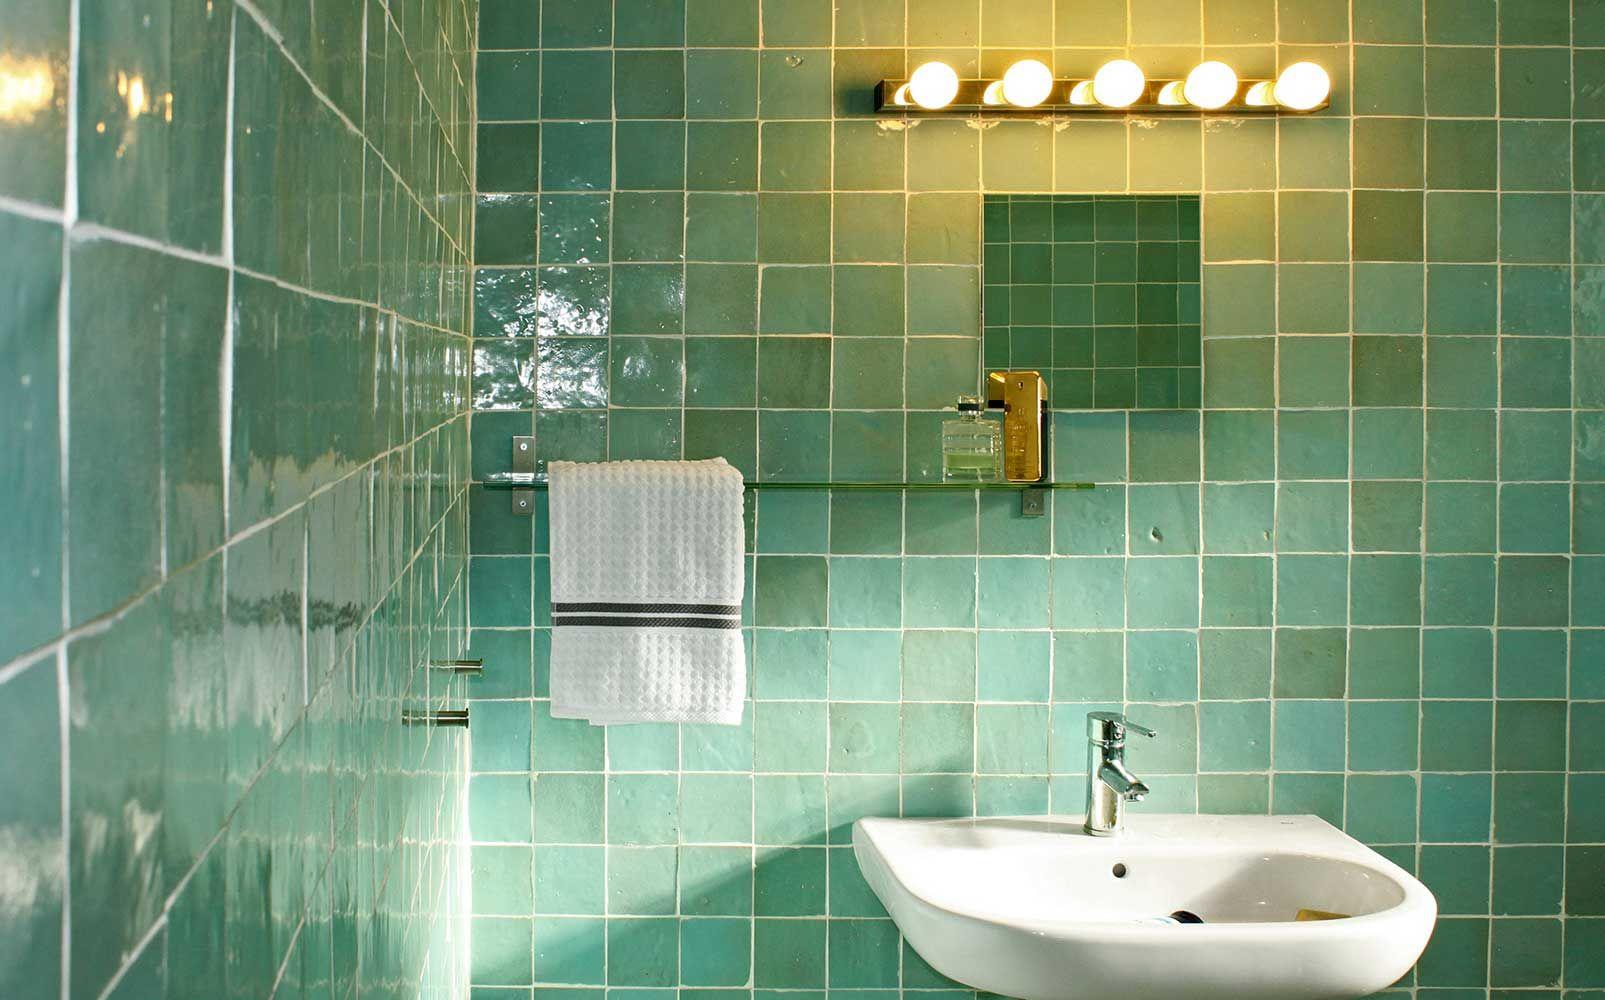 Carreaux zellige  Zellige salle de bain, Salle de bain, Carreaux